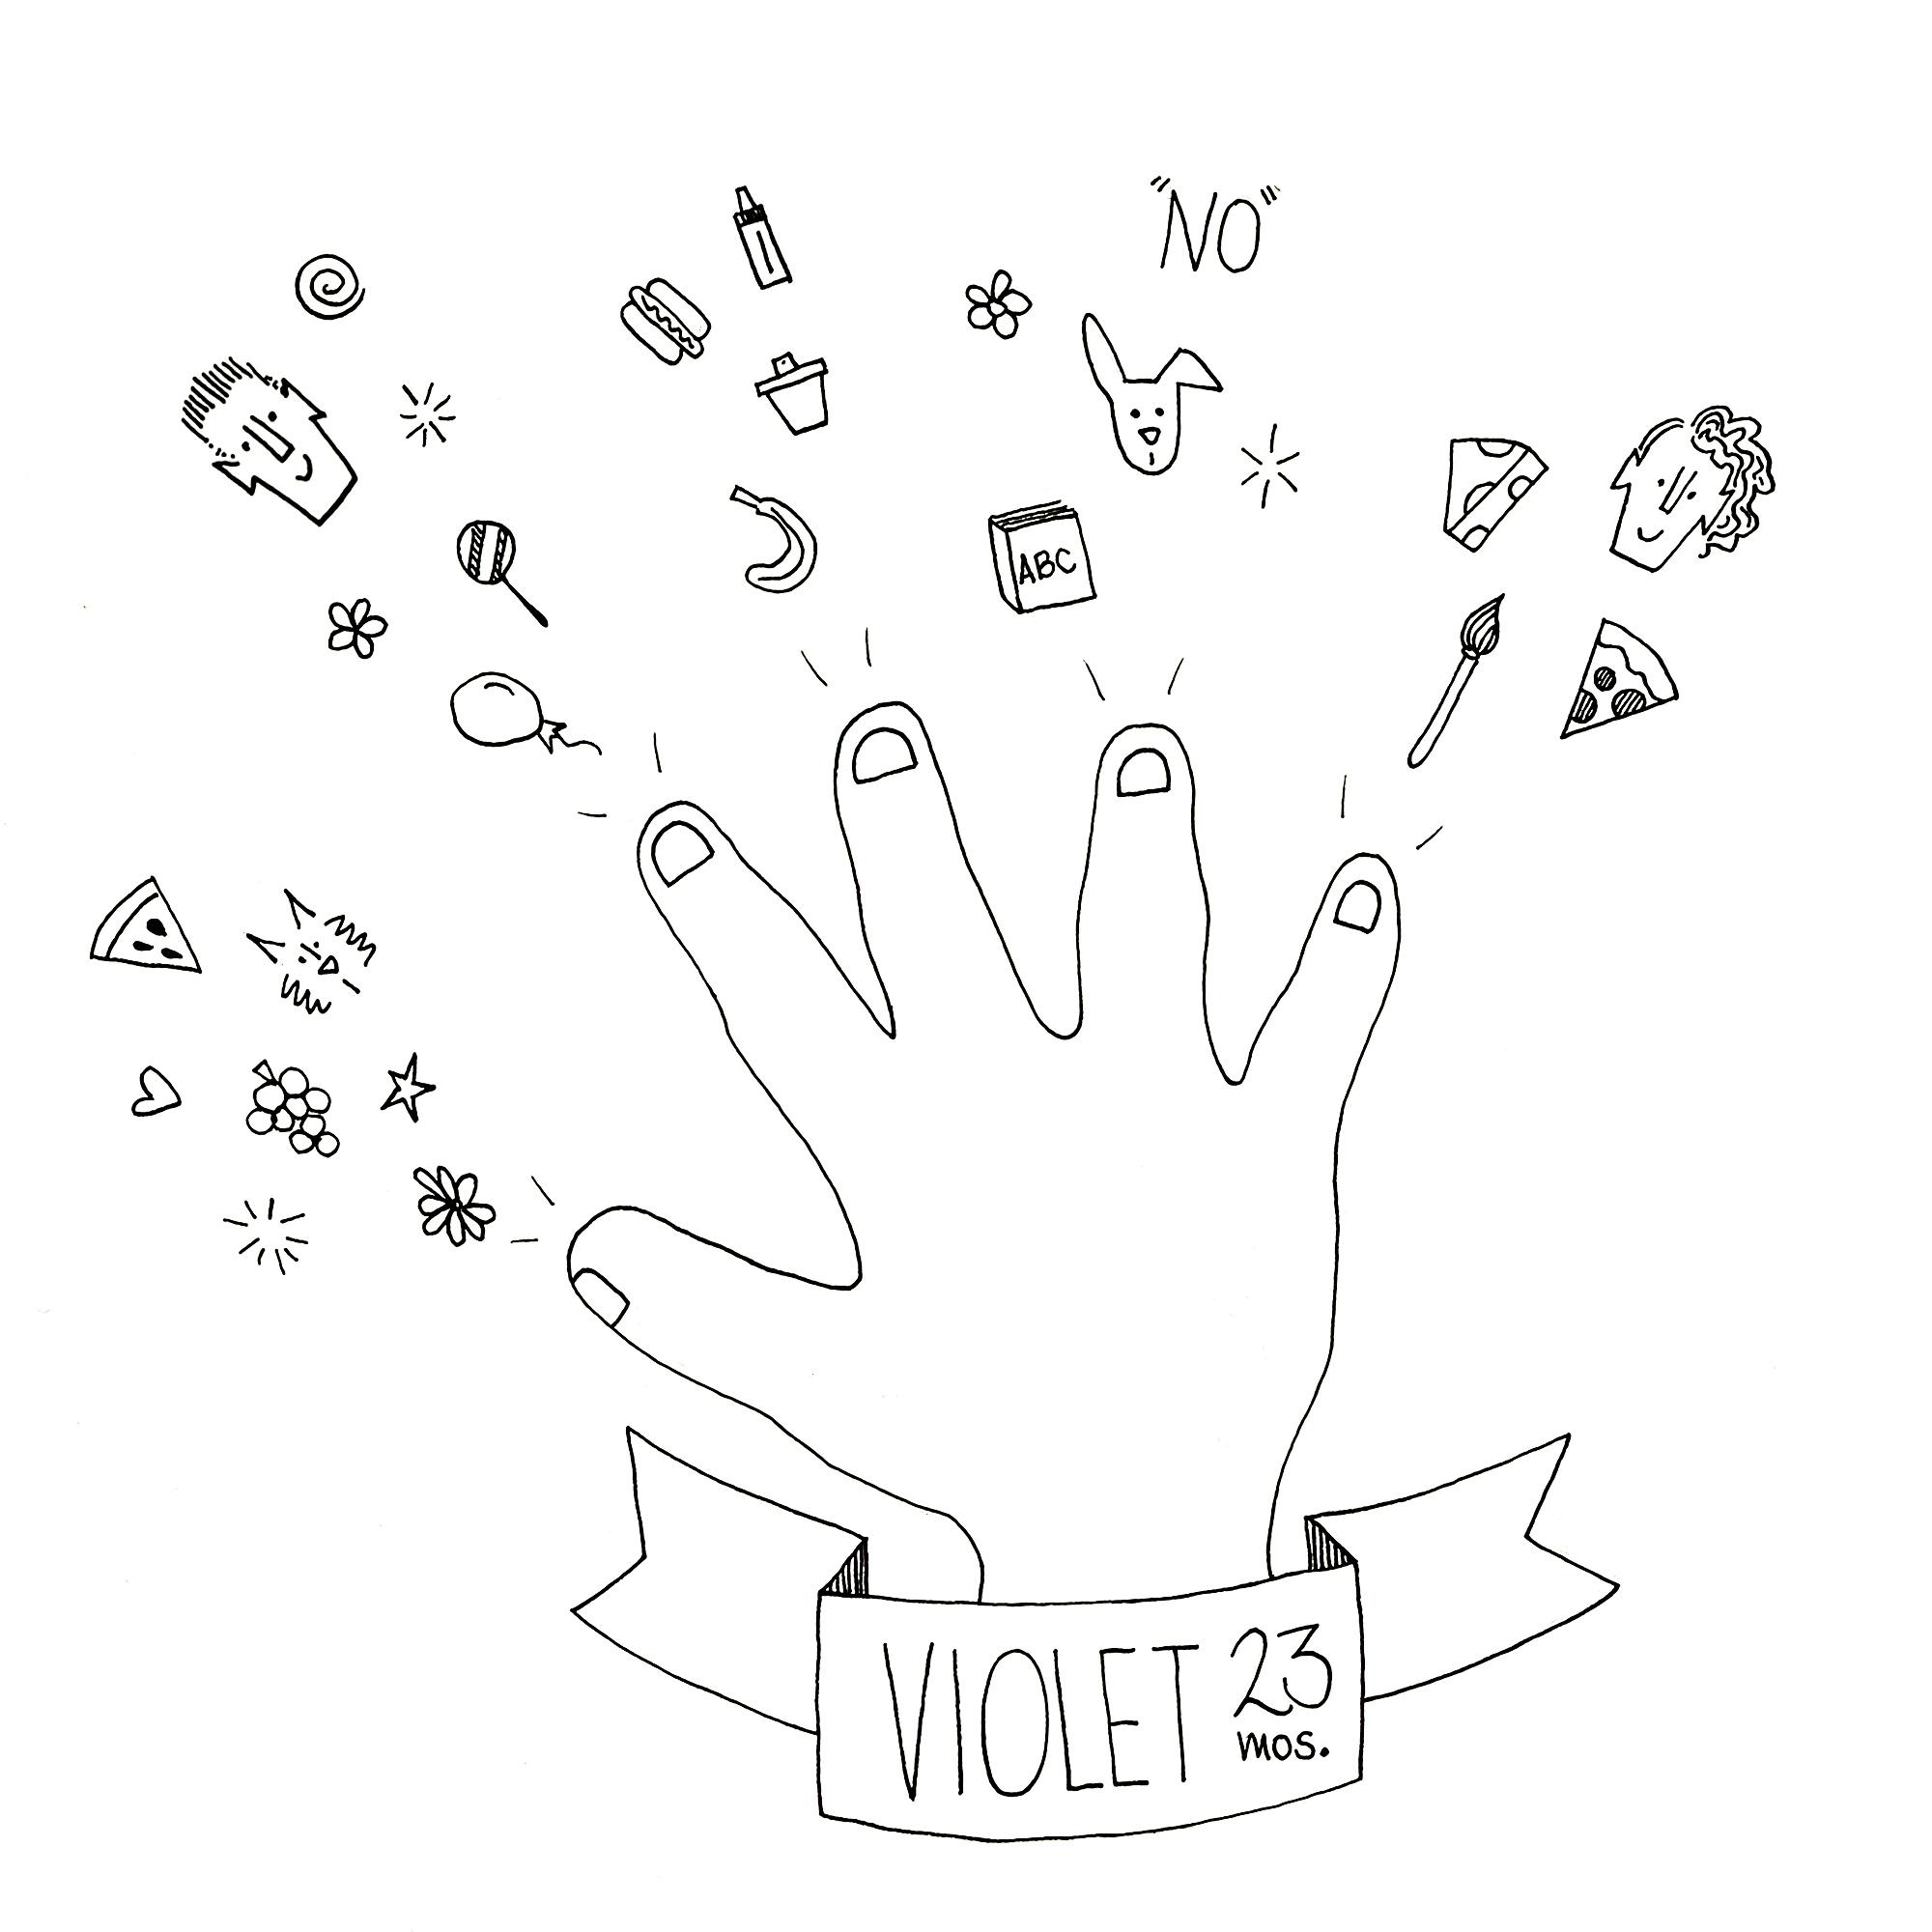 8_27_16_Violet23months_dribbble_bw.jpg